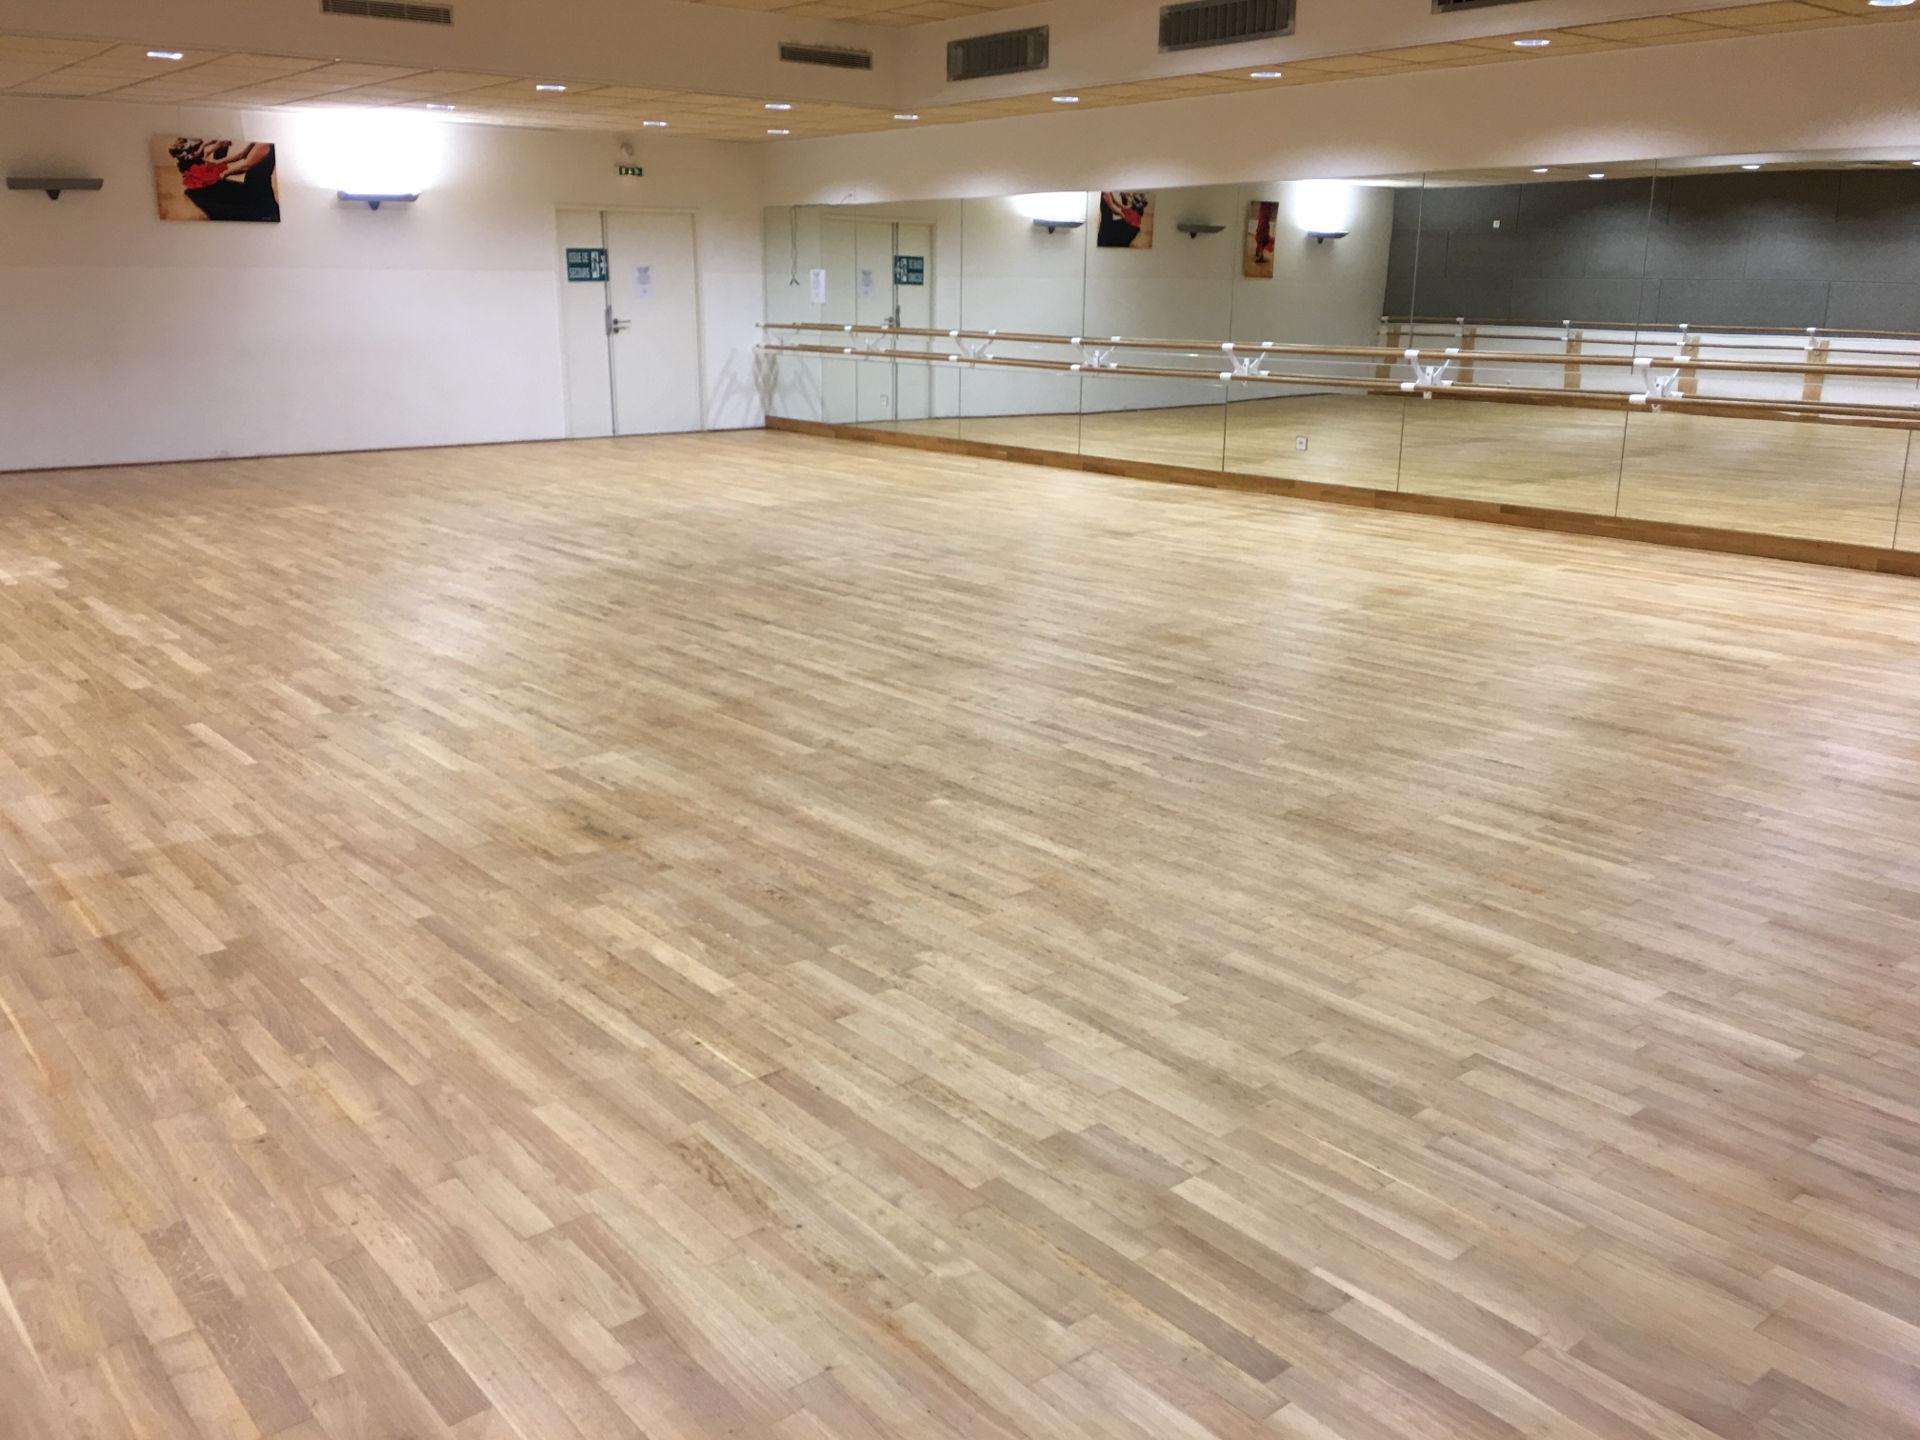 Fabrication salle de danse à Mauguio